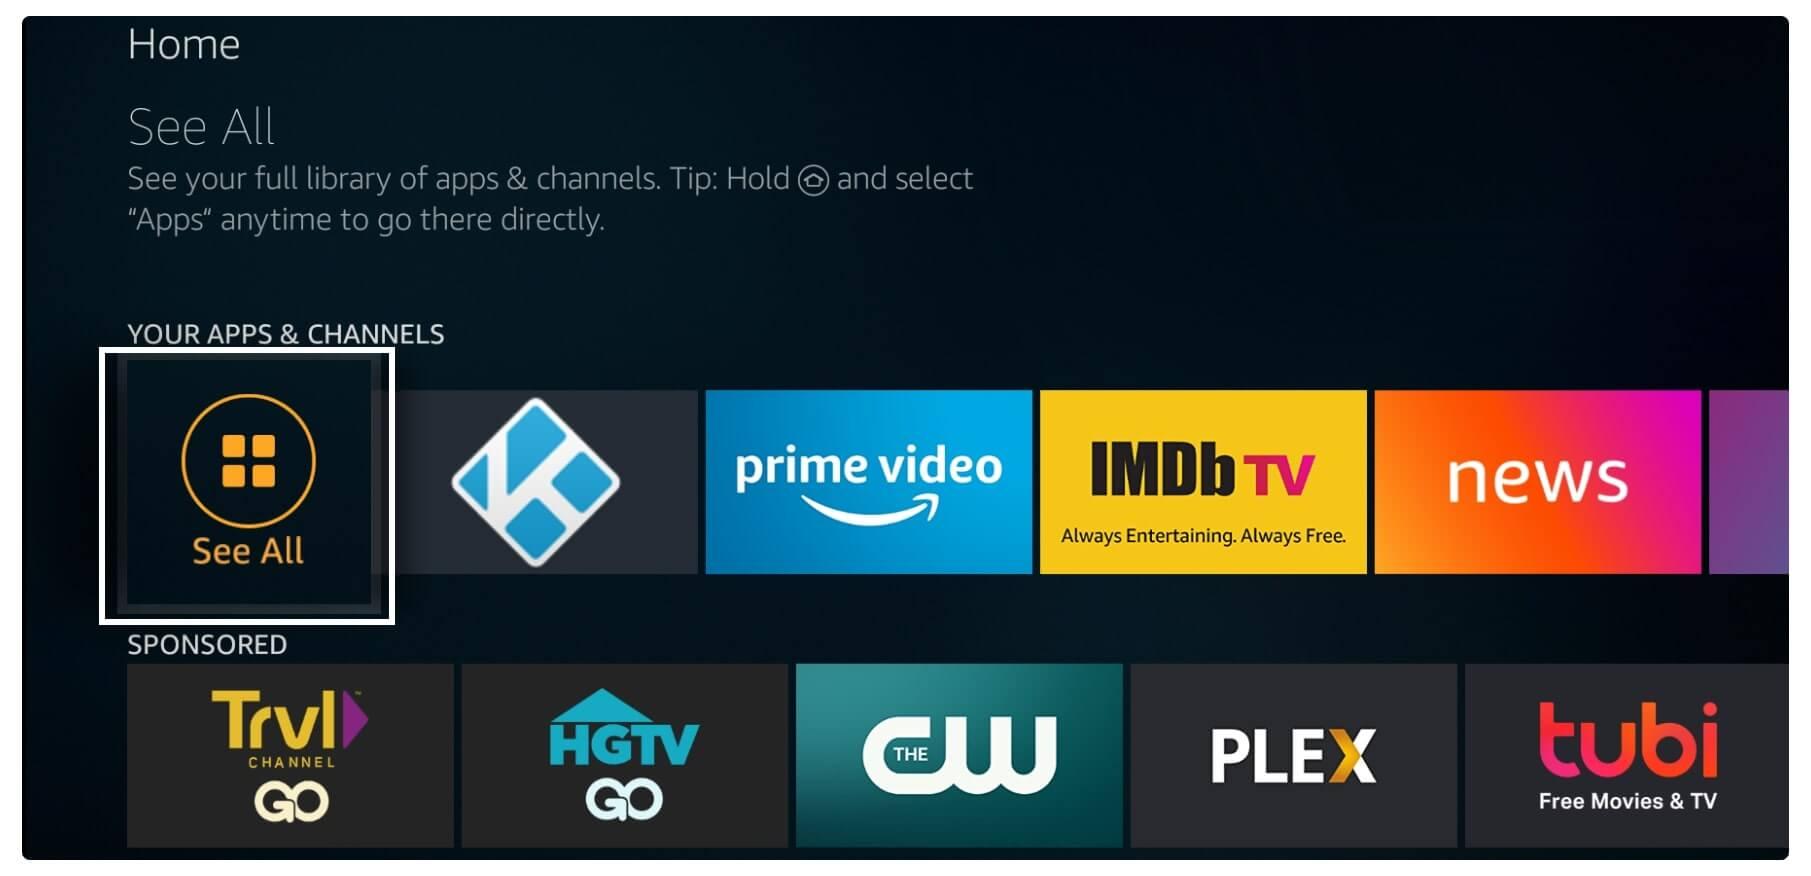 Get-Start-with-BeeTV-on-Amazon-FireTV-Stick